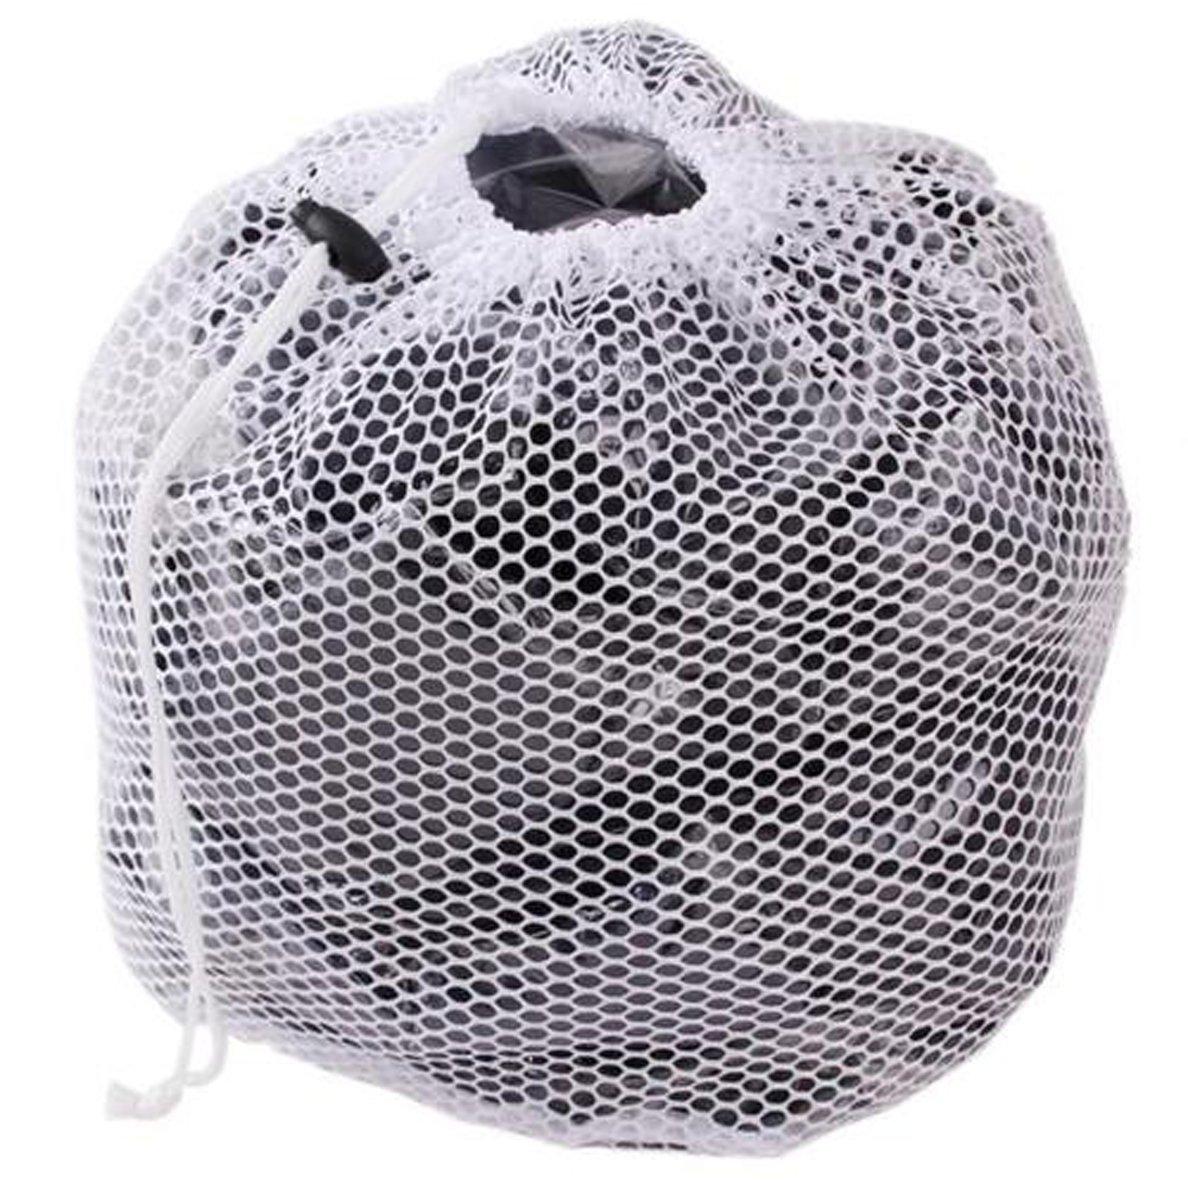 Edtoy White Drawstring Washing Bag for Washing Machine Mesh Net Laundry Bags M